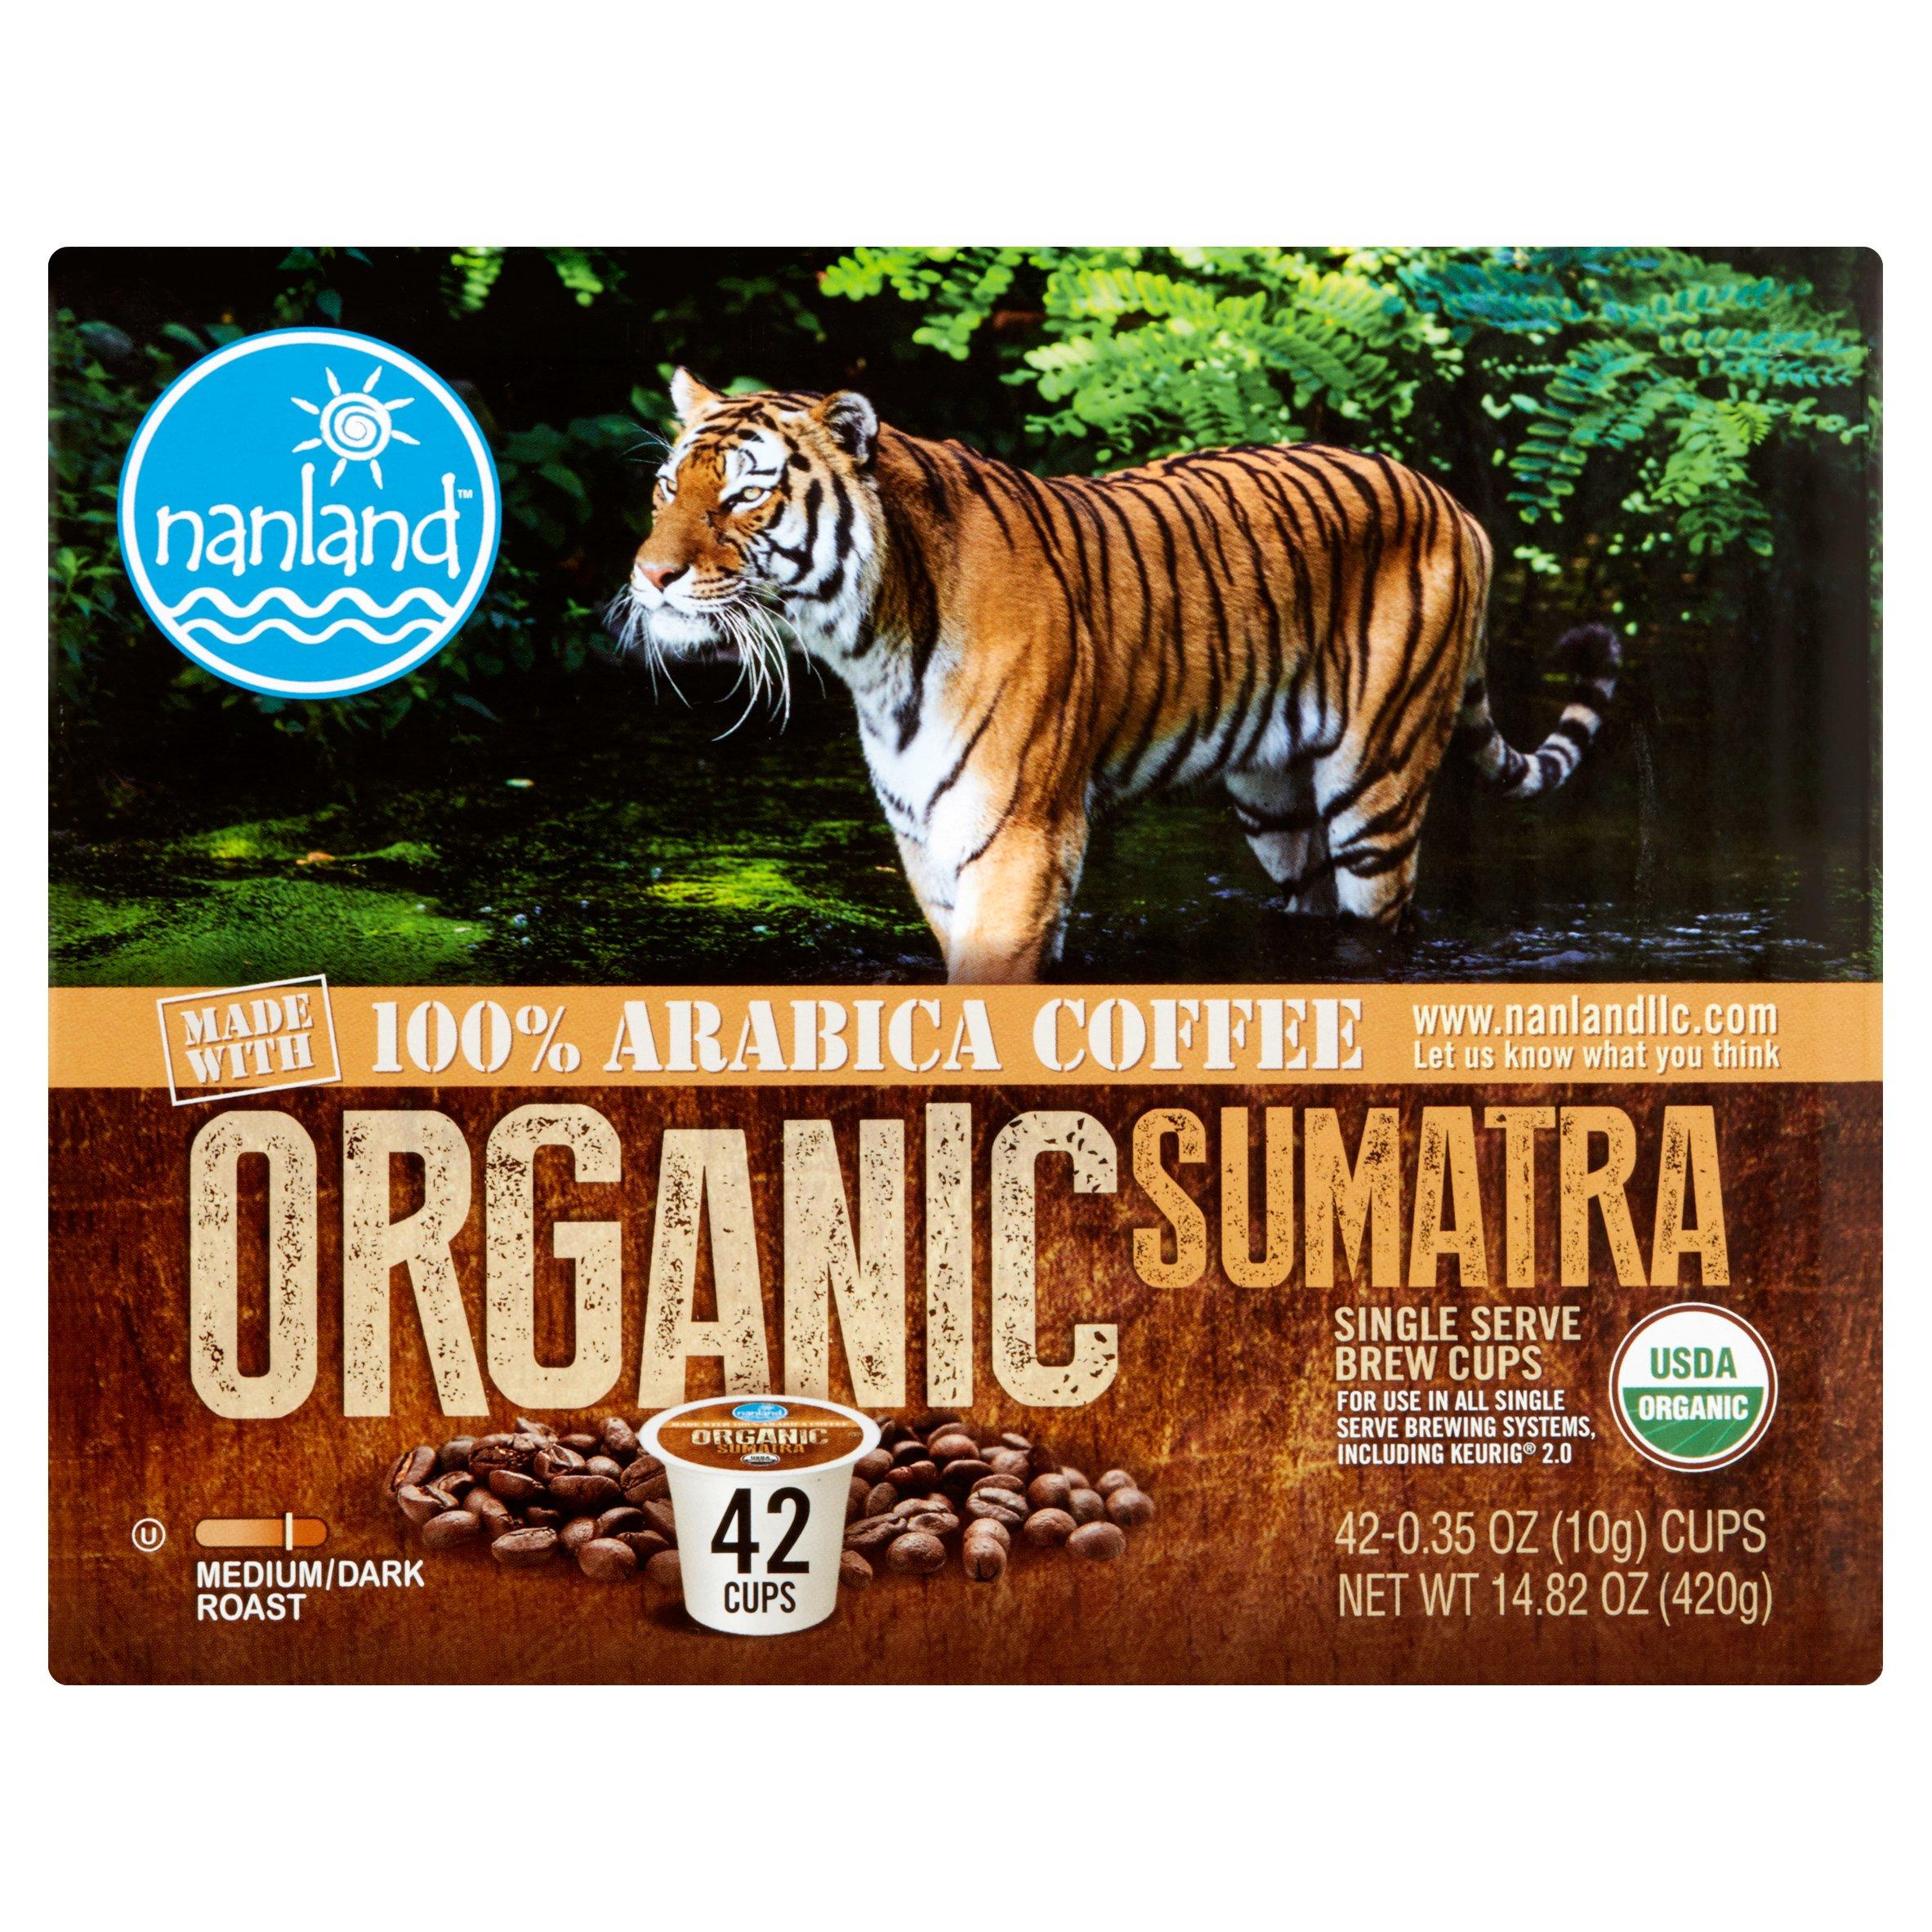 Nanland Organic Sumatra Medium/Dark Roast Single Serve Brew Cups, 0.35 oz, 42 count